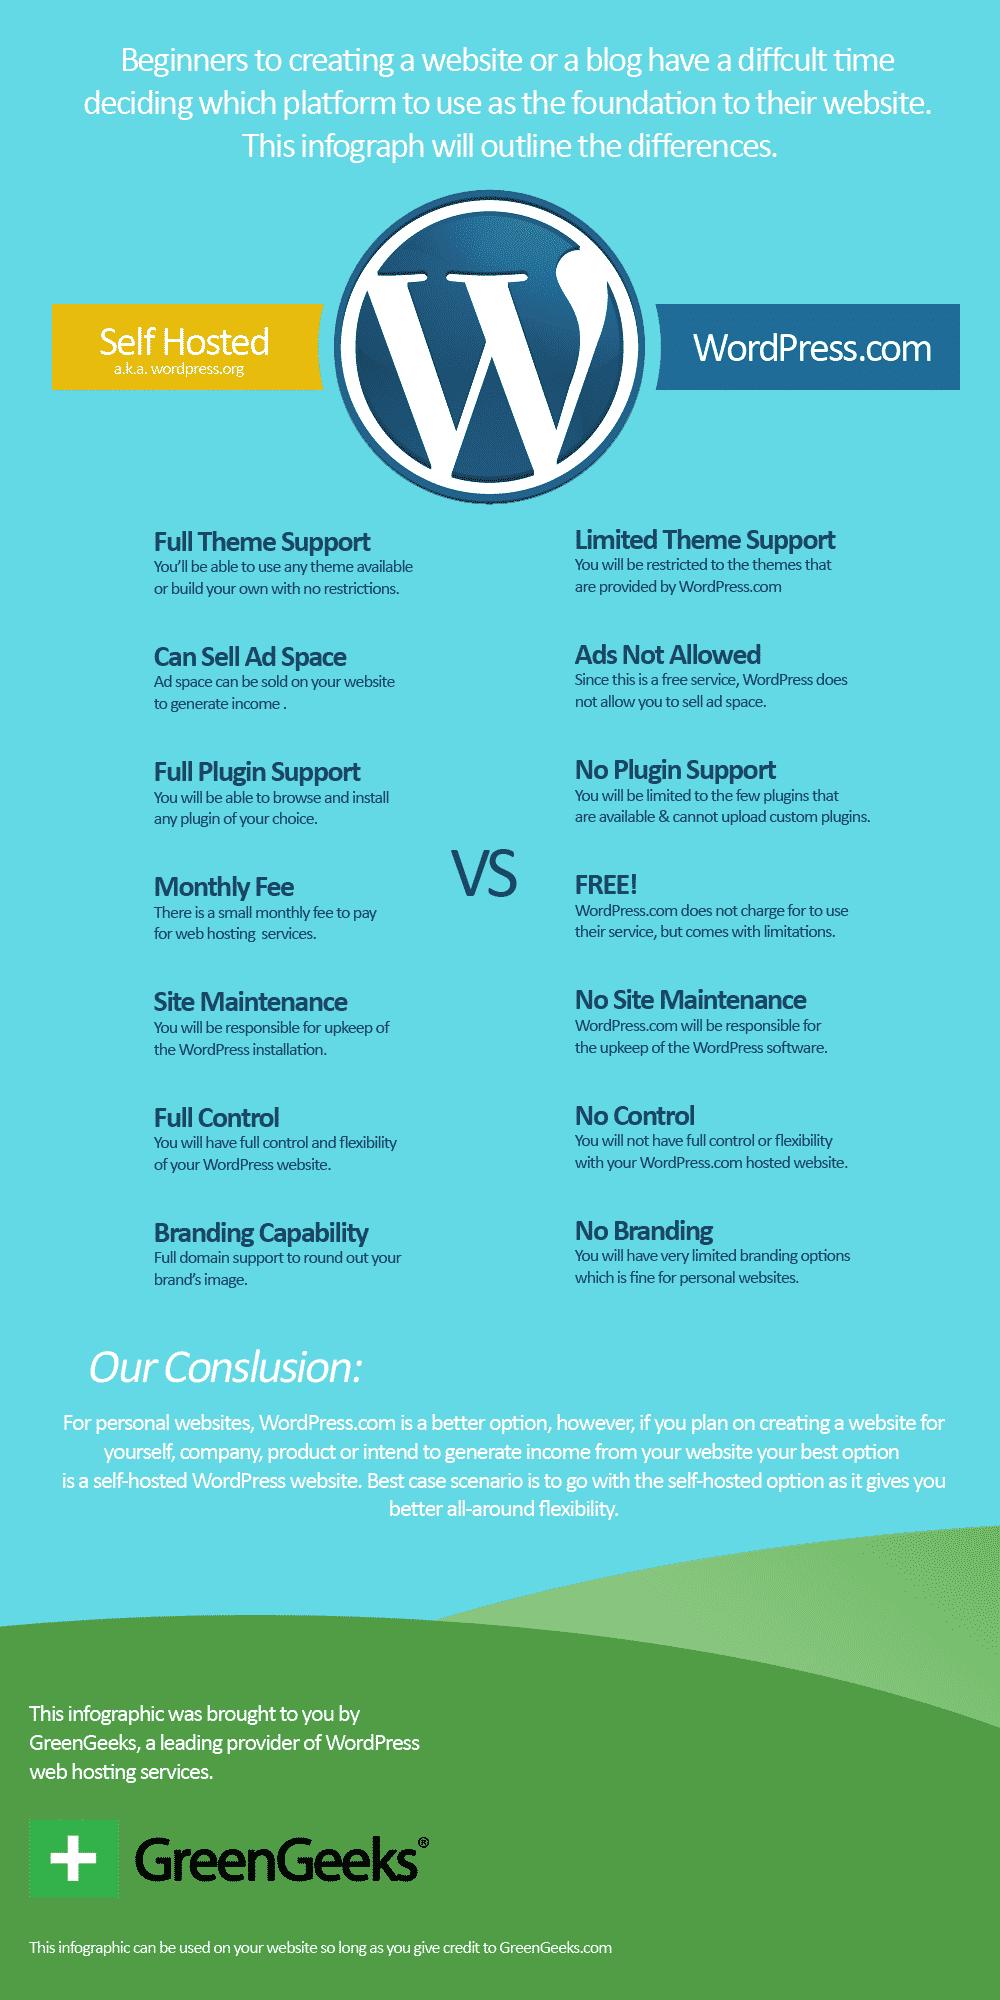 WordPress Free vs Self Hosted